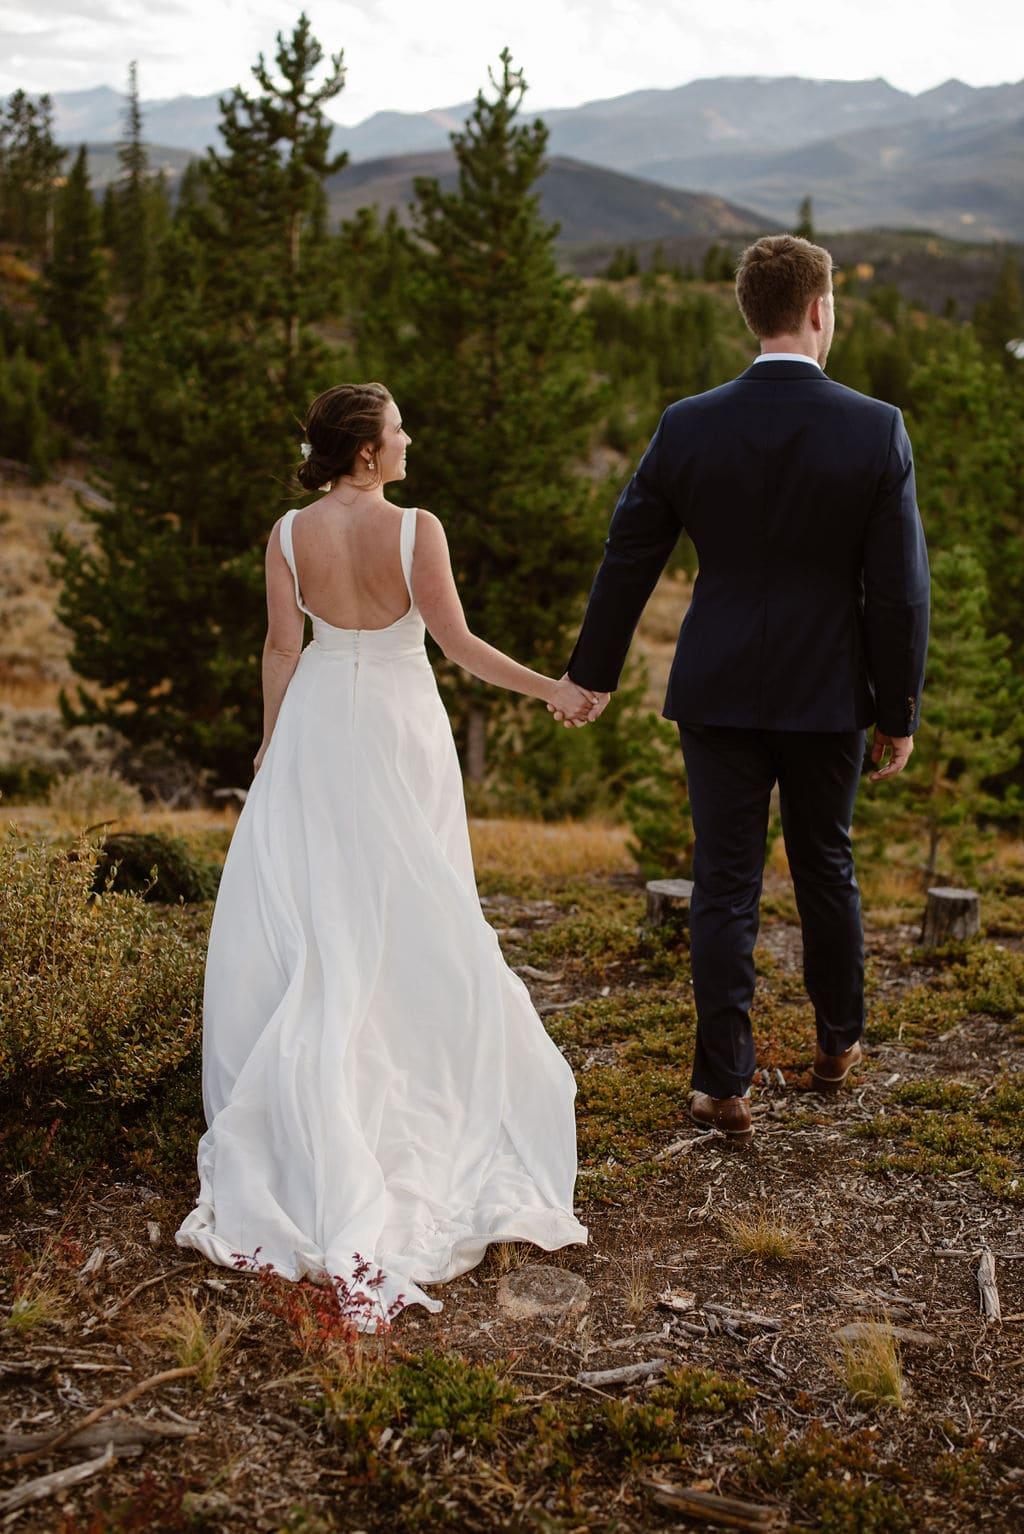 Romantic Bride and Groom Mountain Portraits at Lake Dillon in Colorado